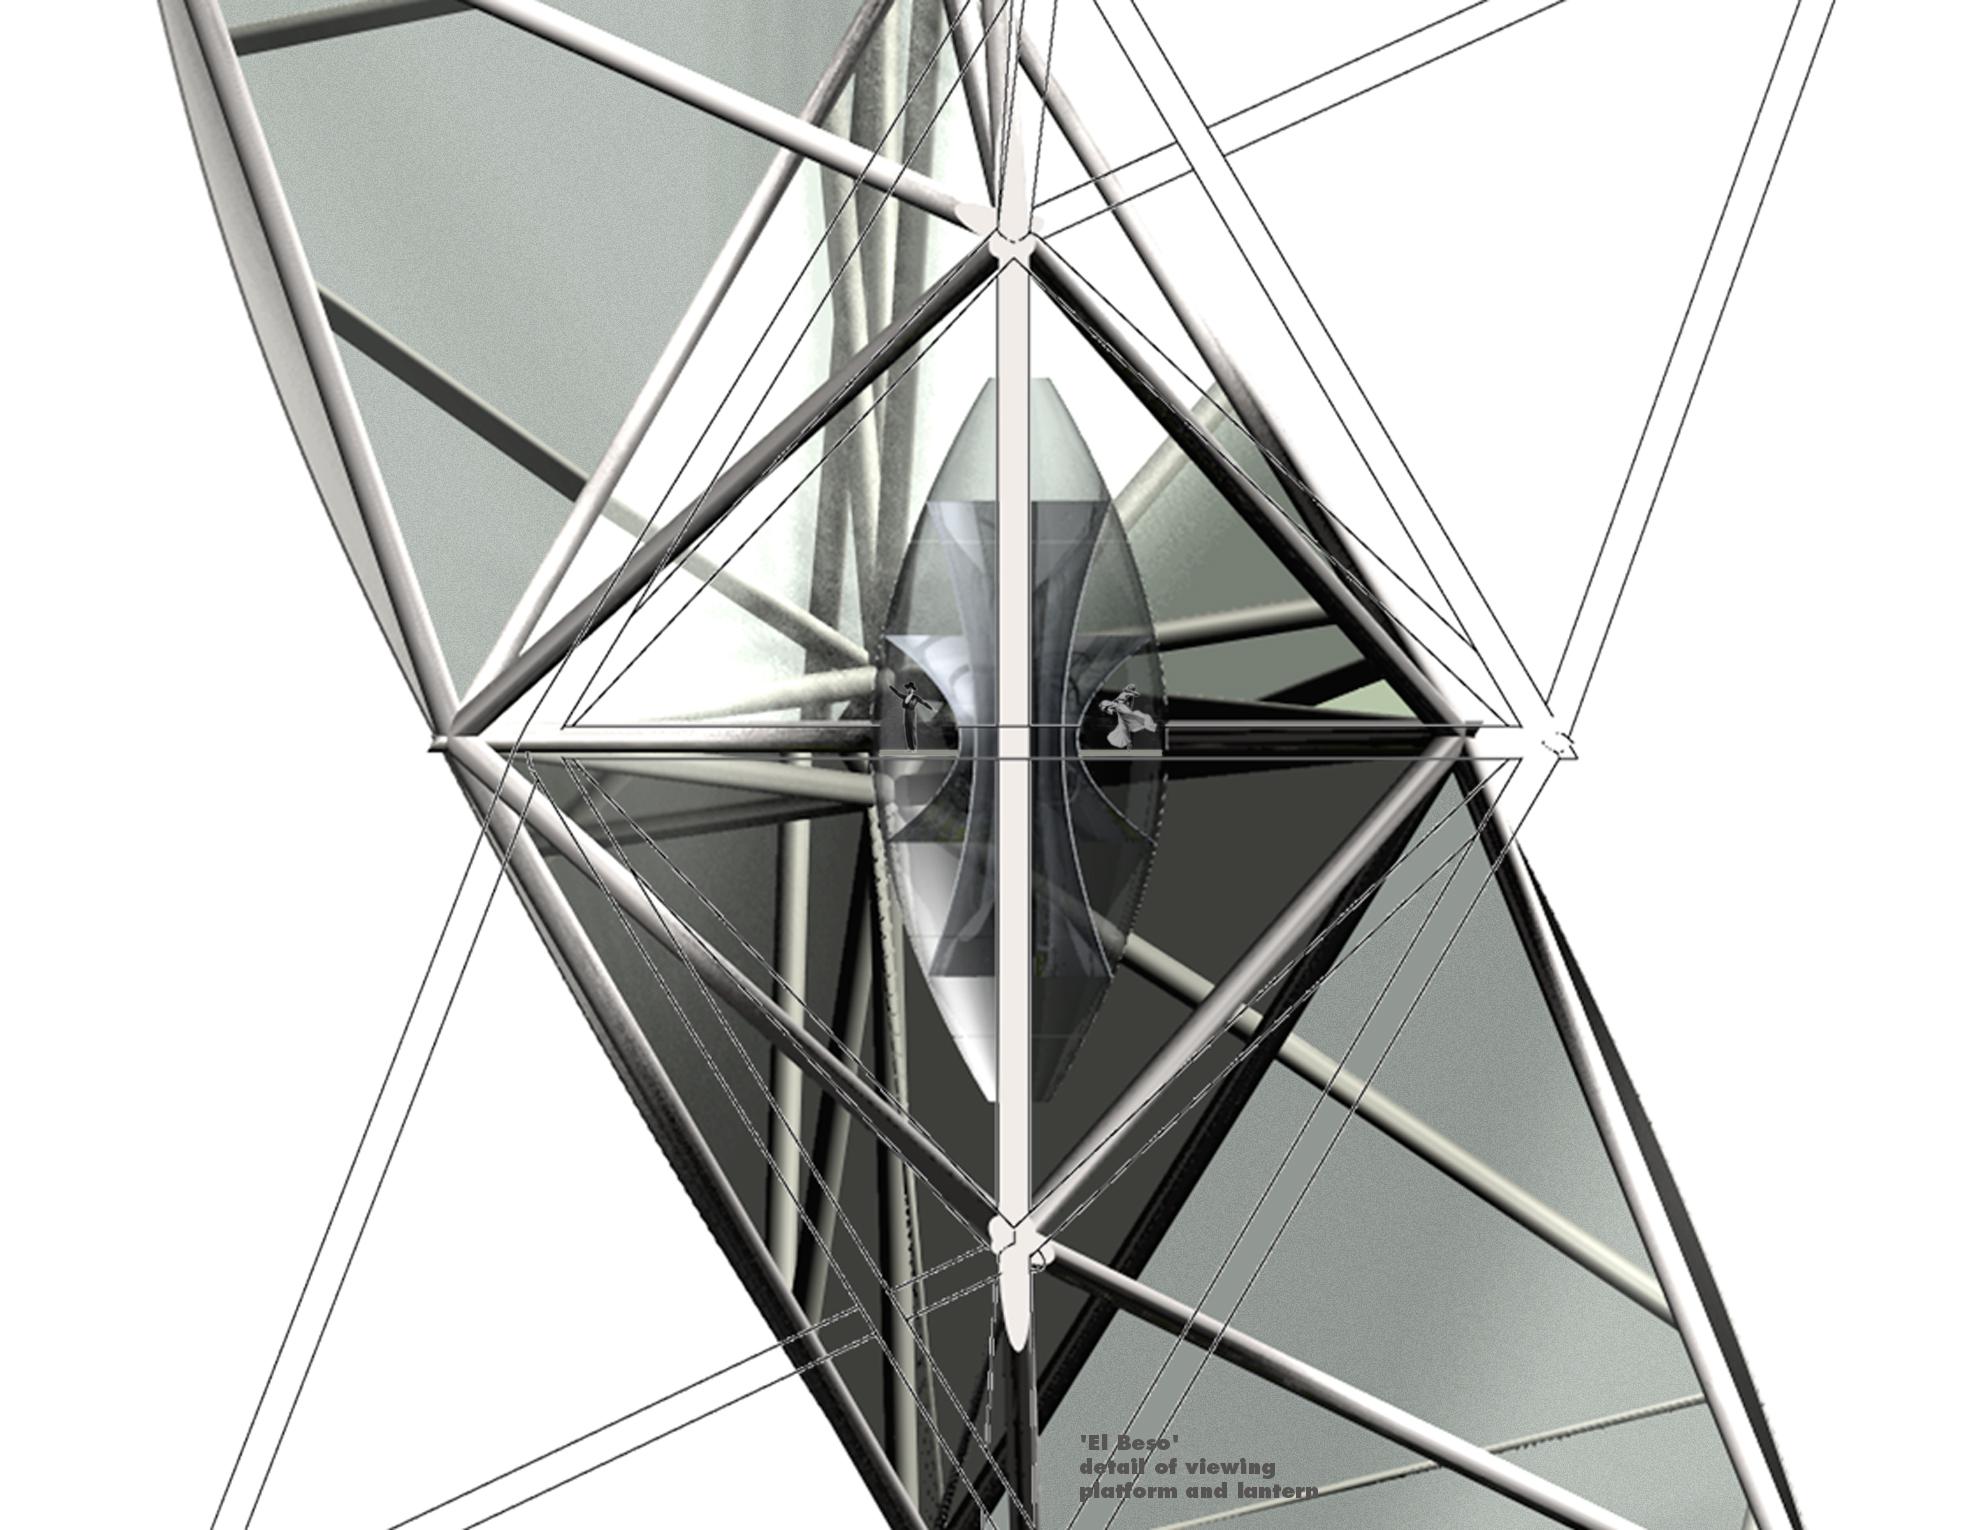 observation platform closeup